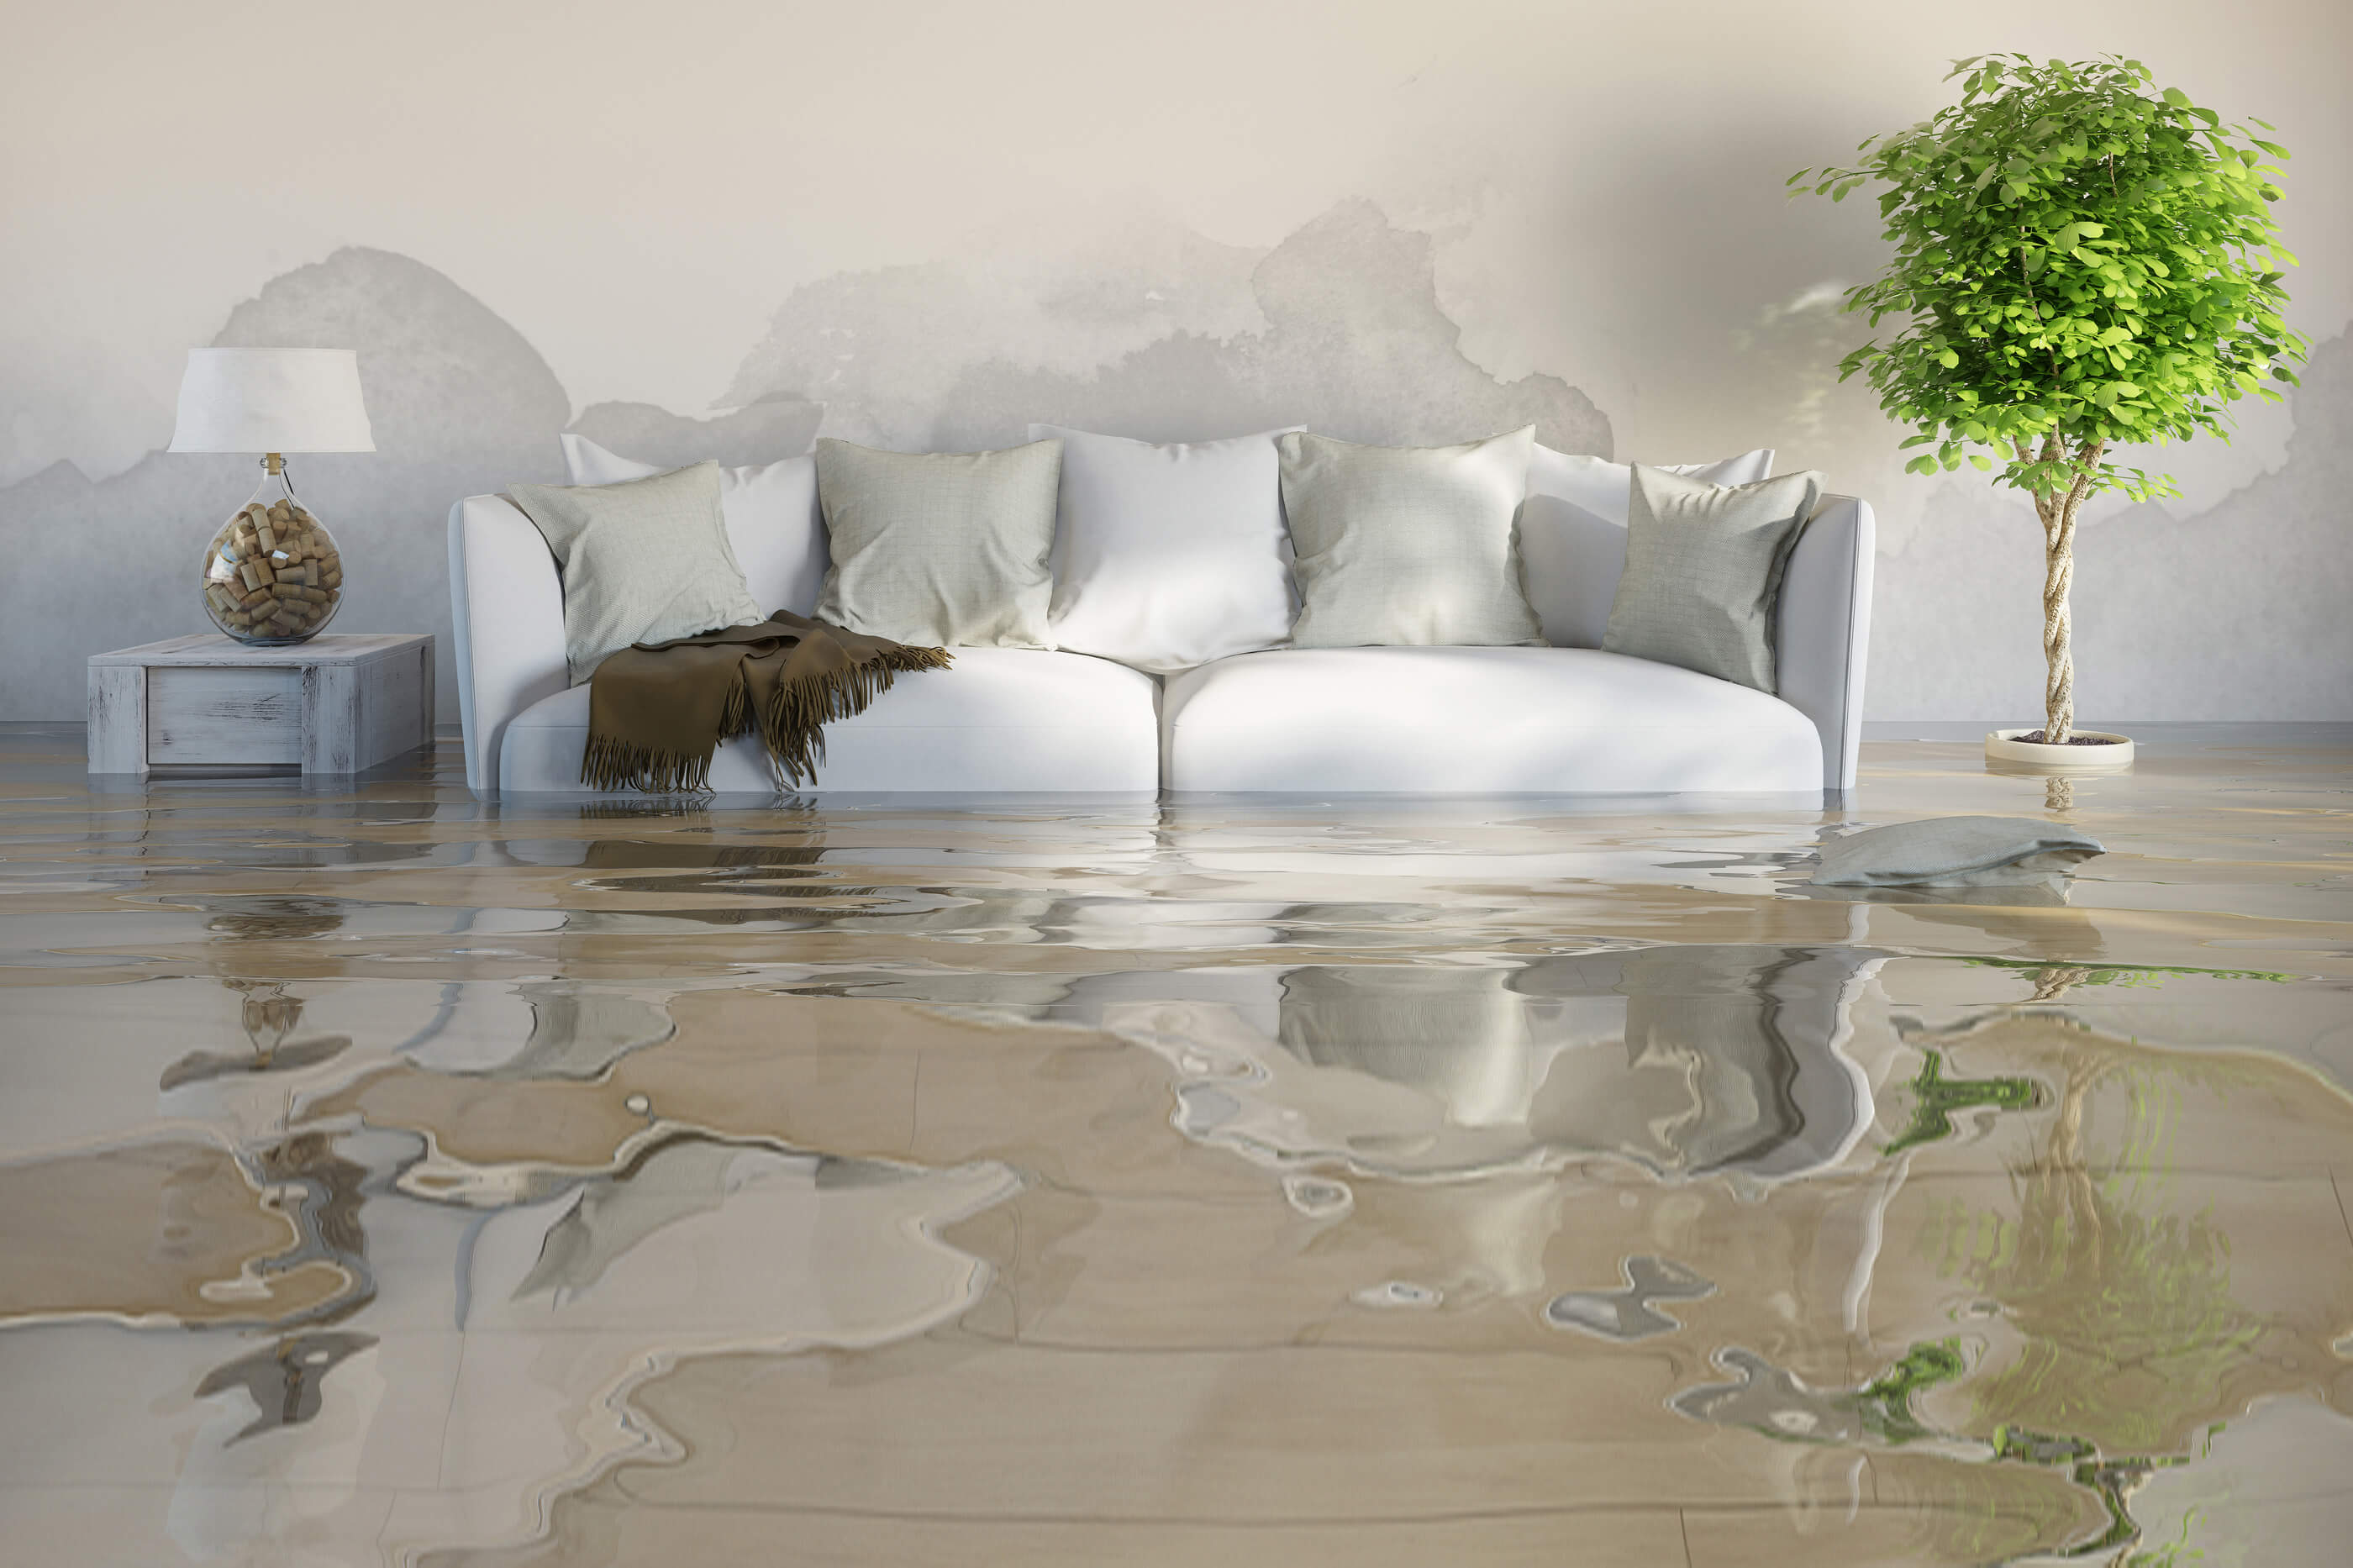 Mira Mesa Flood Service